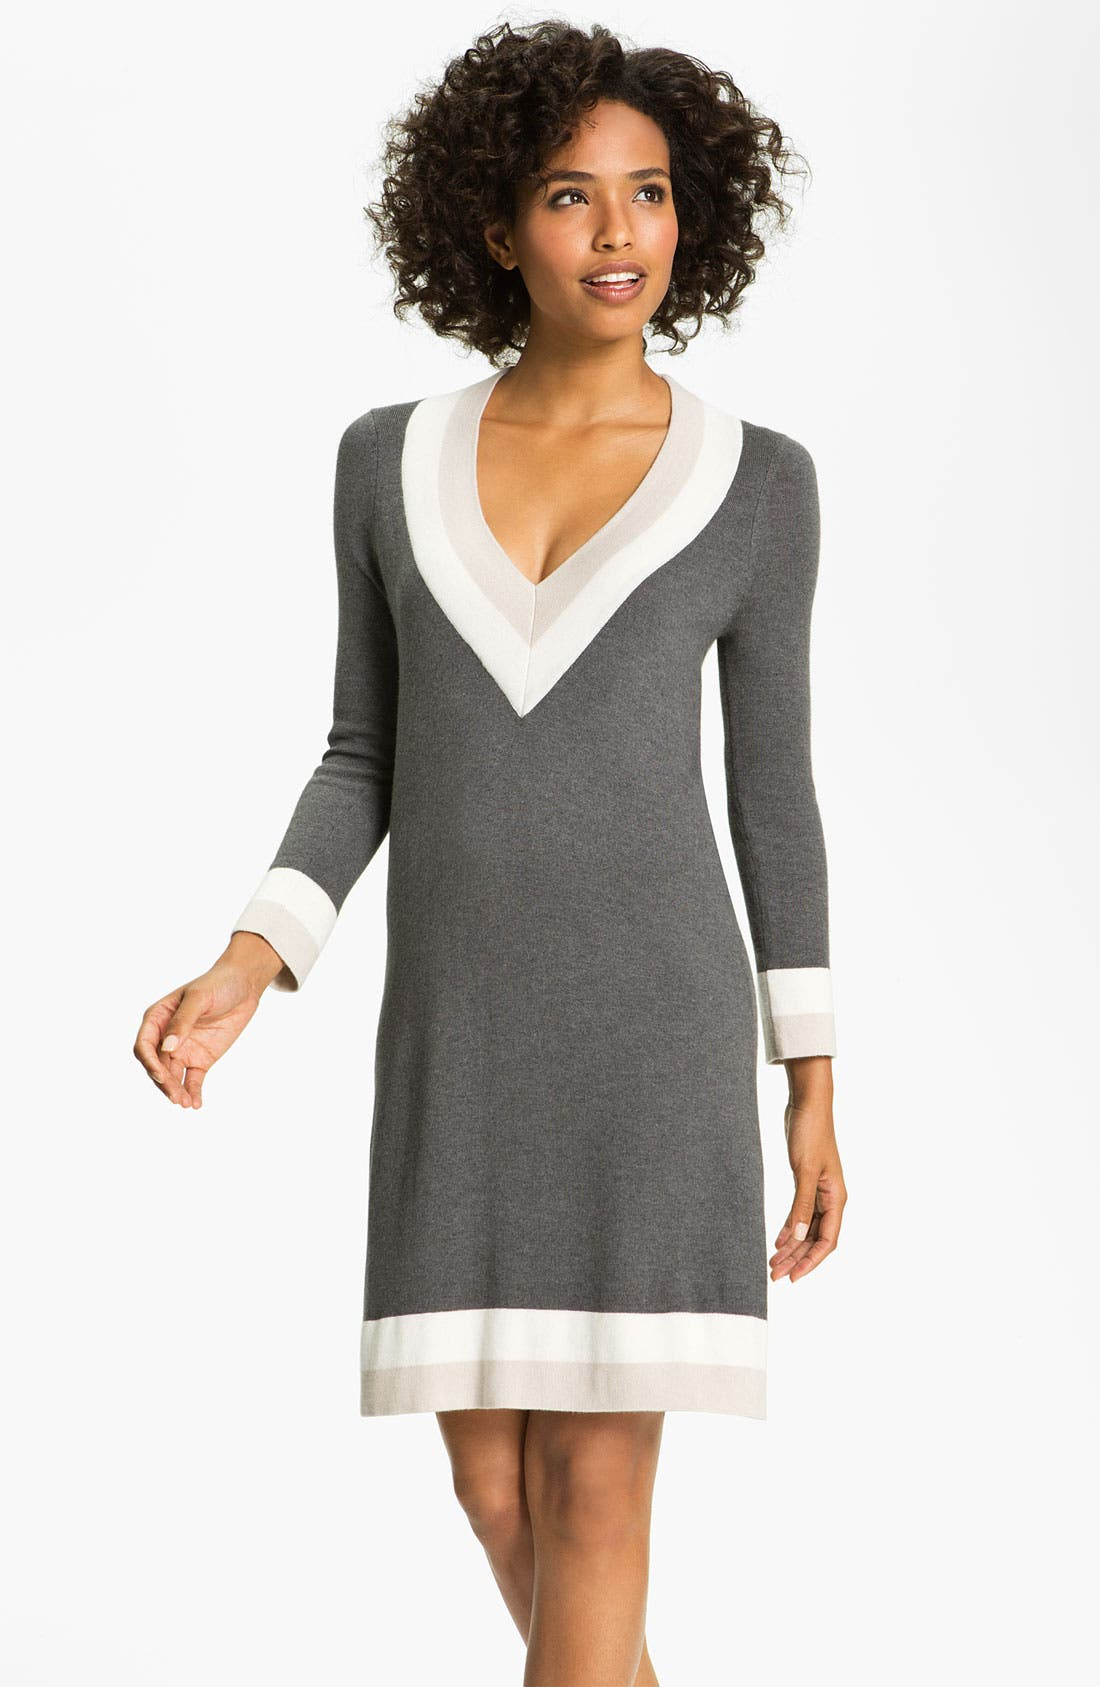 Main Image - Felicity & Coco Colorblock V-Neck Sweater Dress (Regular & Petite) (Nordstrom Exclusive)